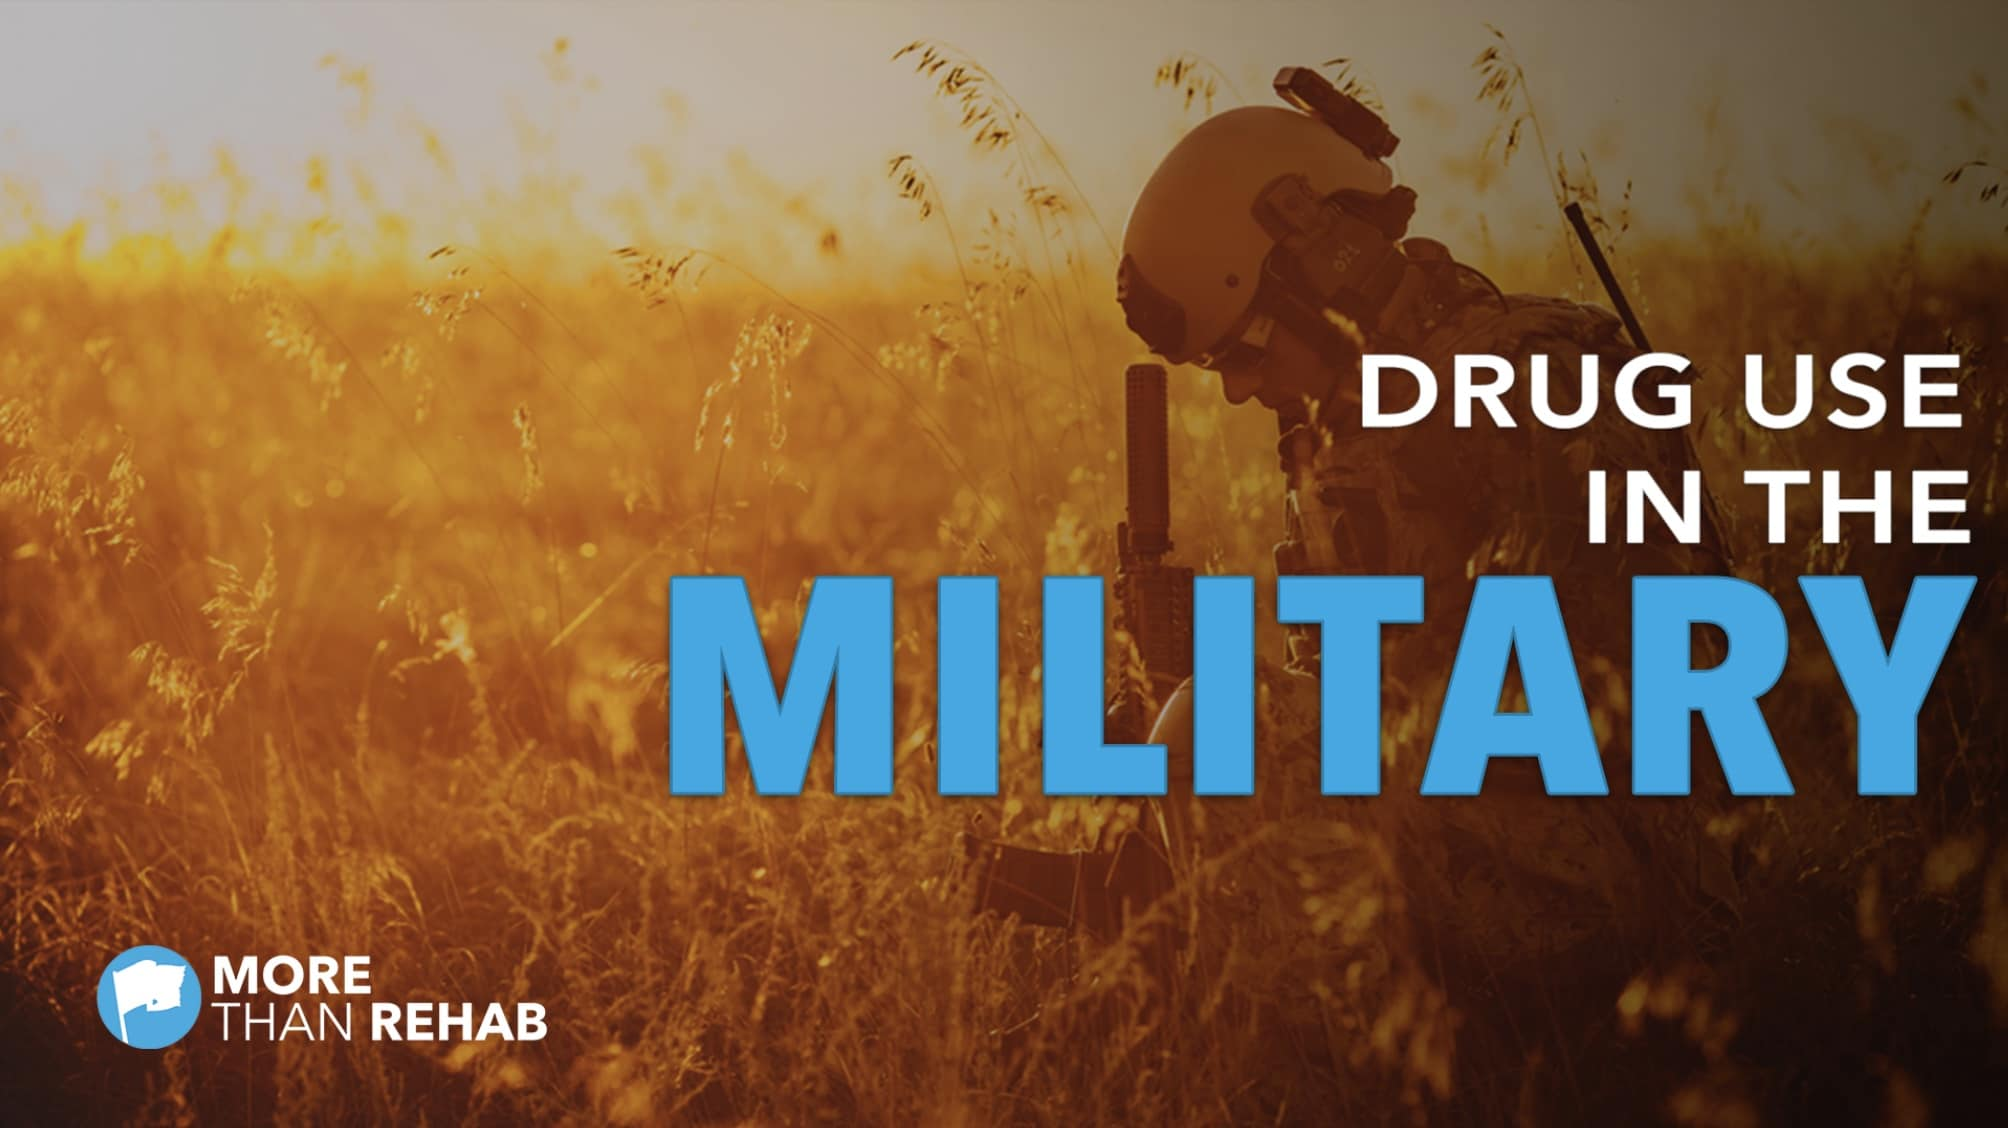 military-veterans-active-duty-drug-use-addiction-mental-health-fort-hood-Killeen-Texas